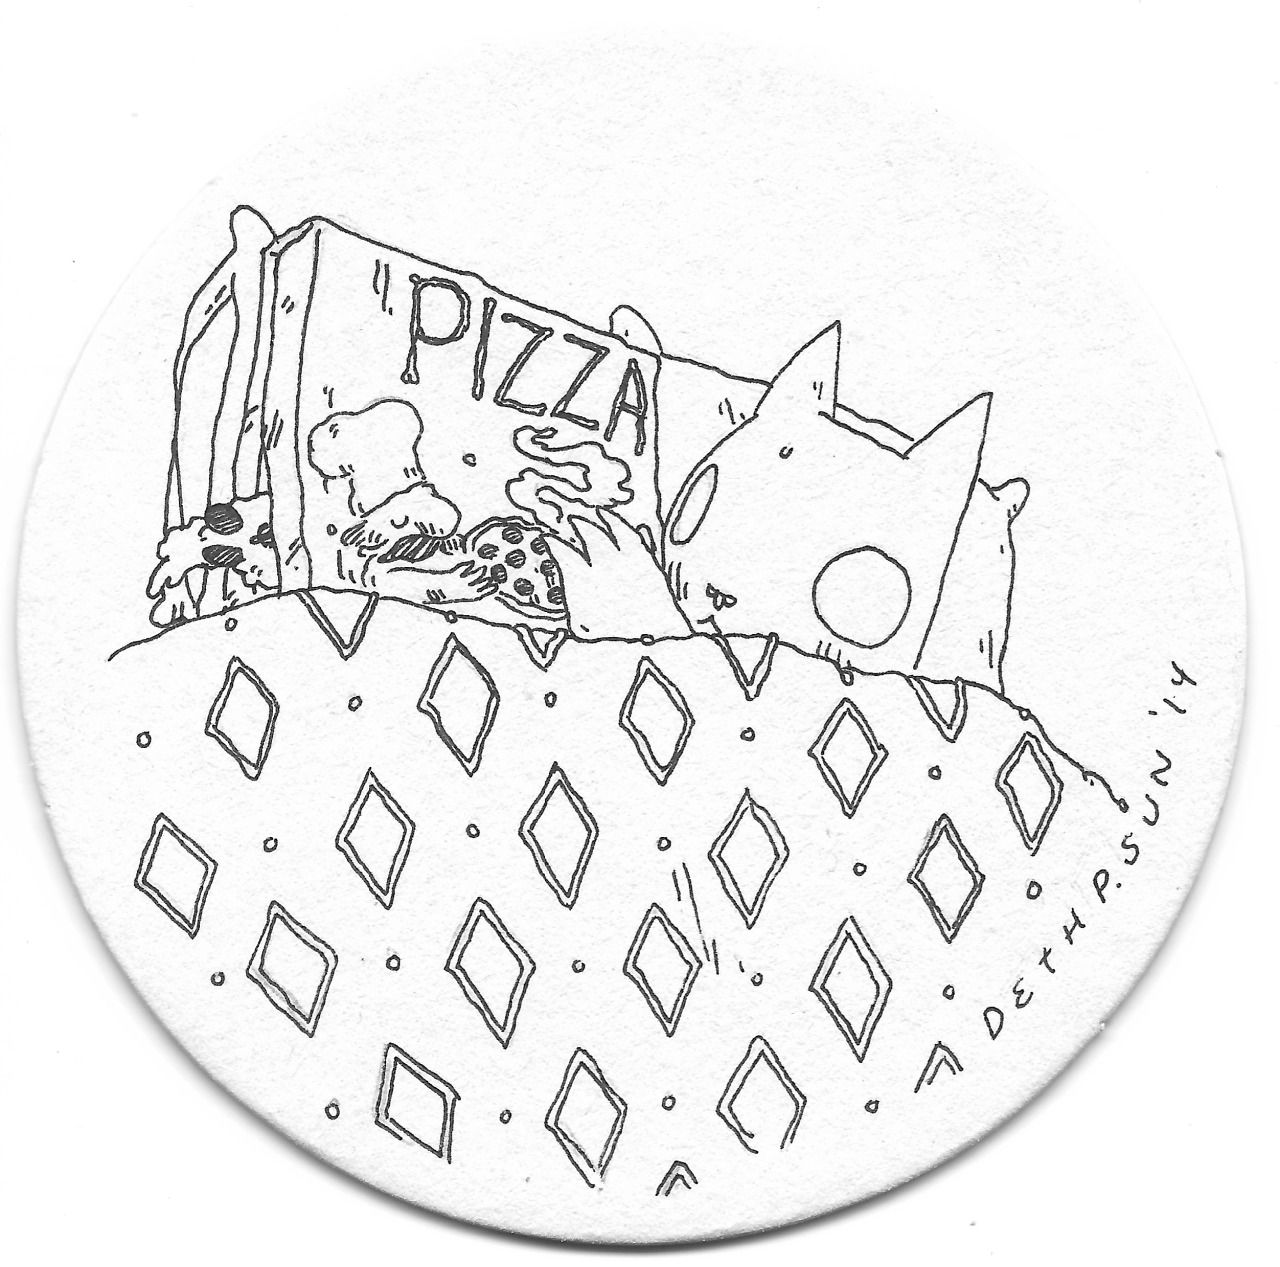 Coaster Drawings